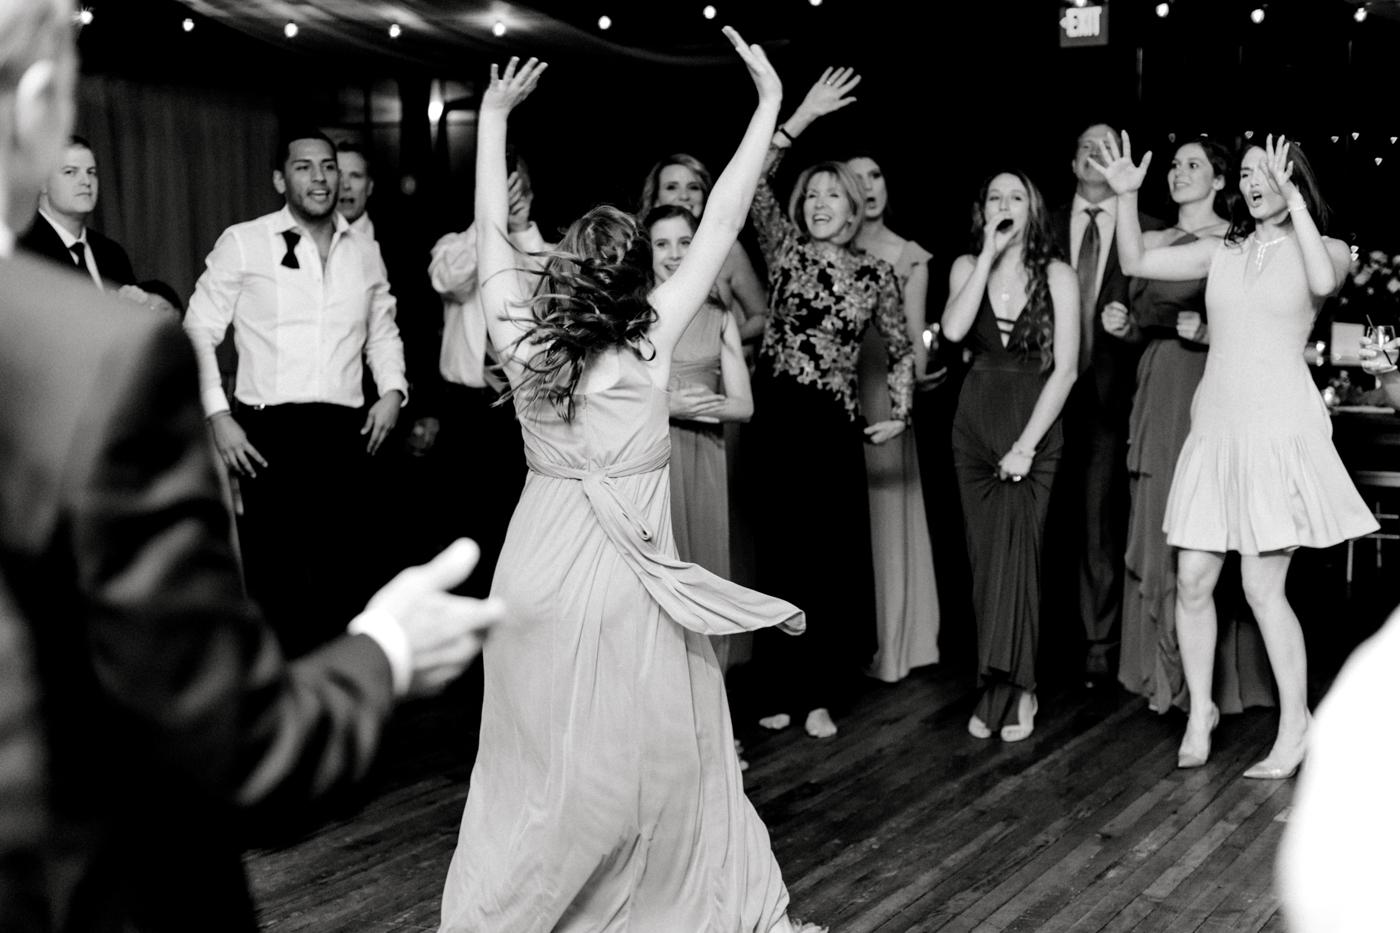 four corners photography best atlanta wedding photographer summerour wedding summer atlanta wedding photographer summerour wedding photos atlanta wedding photo inspiration-88.jpg